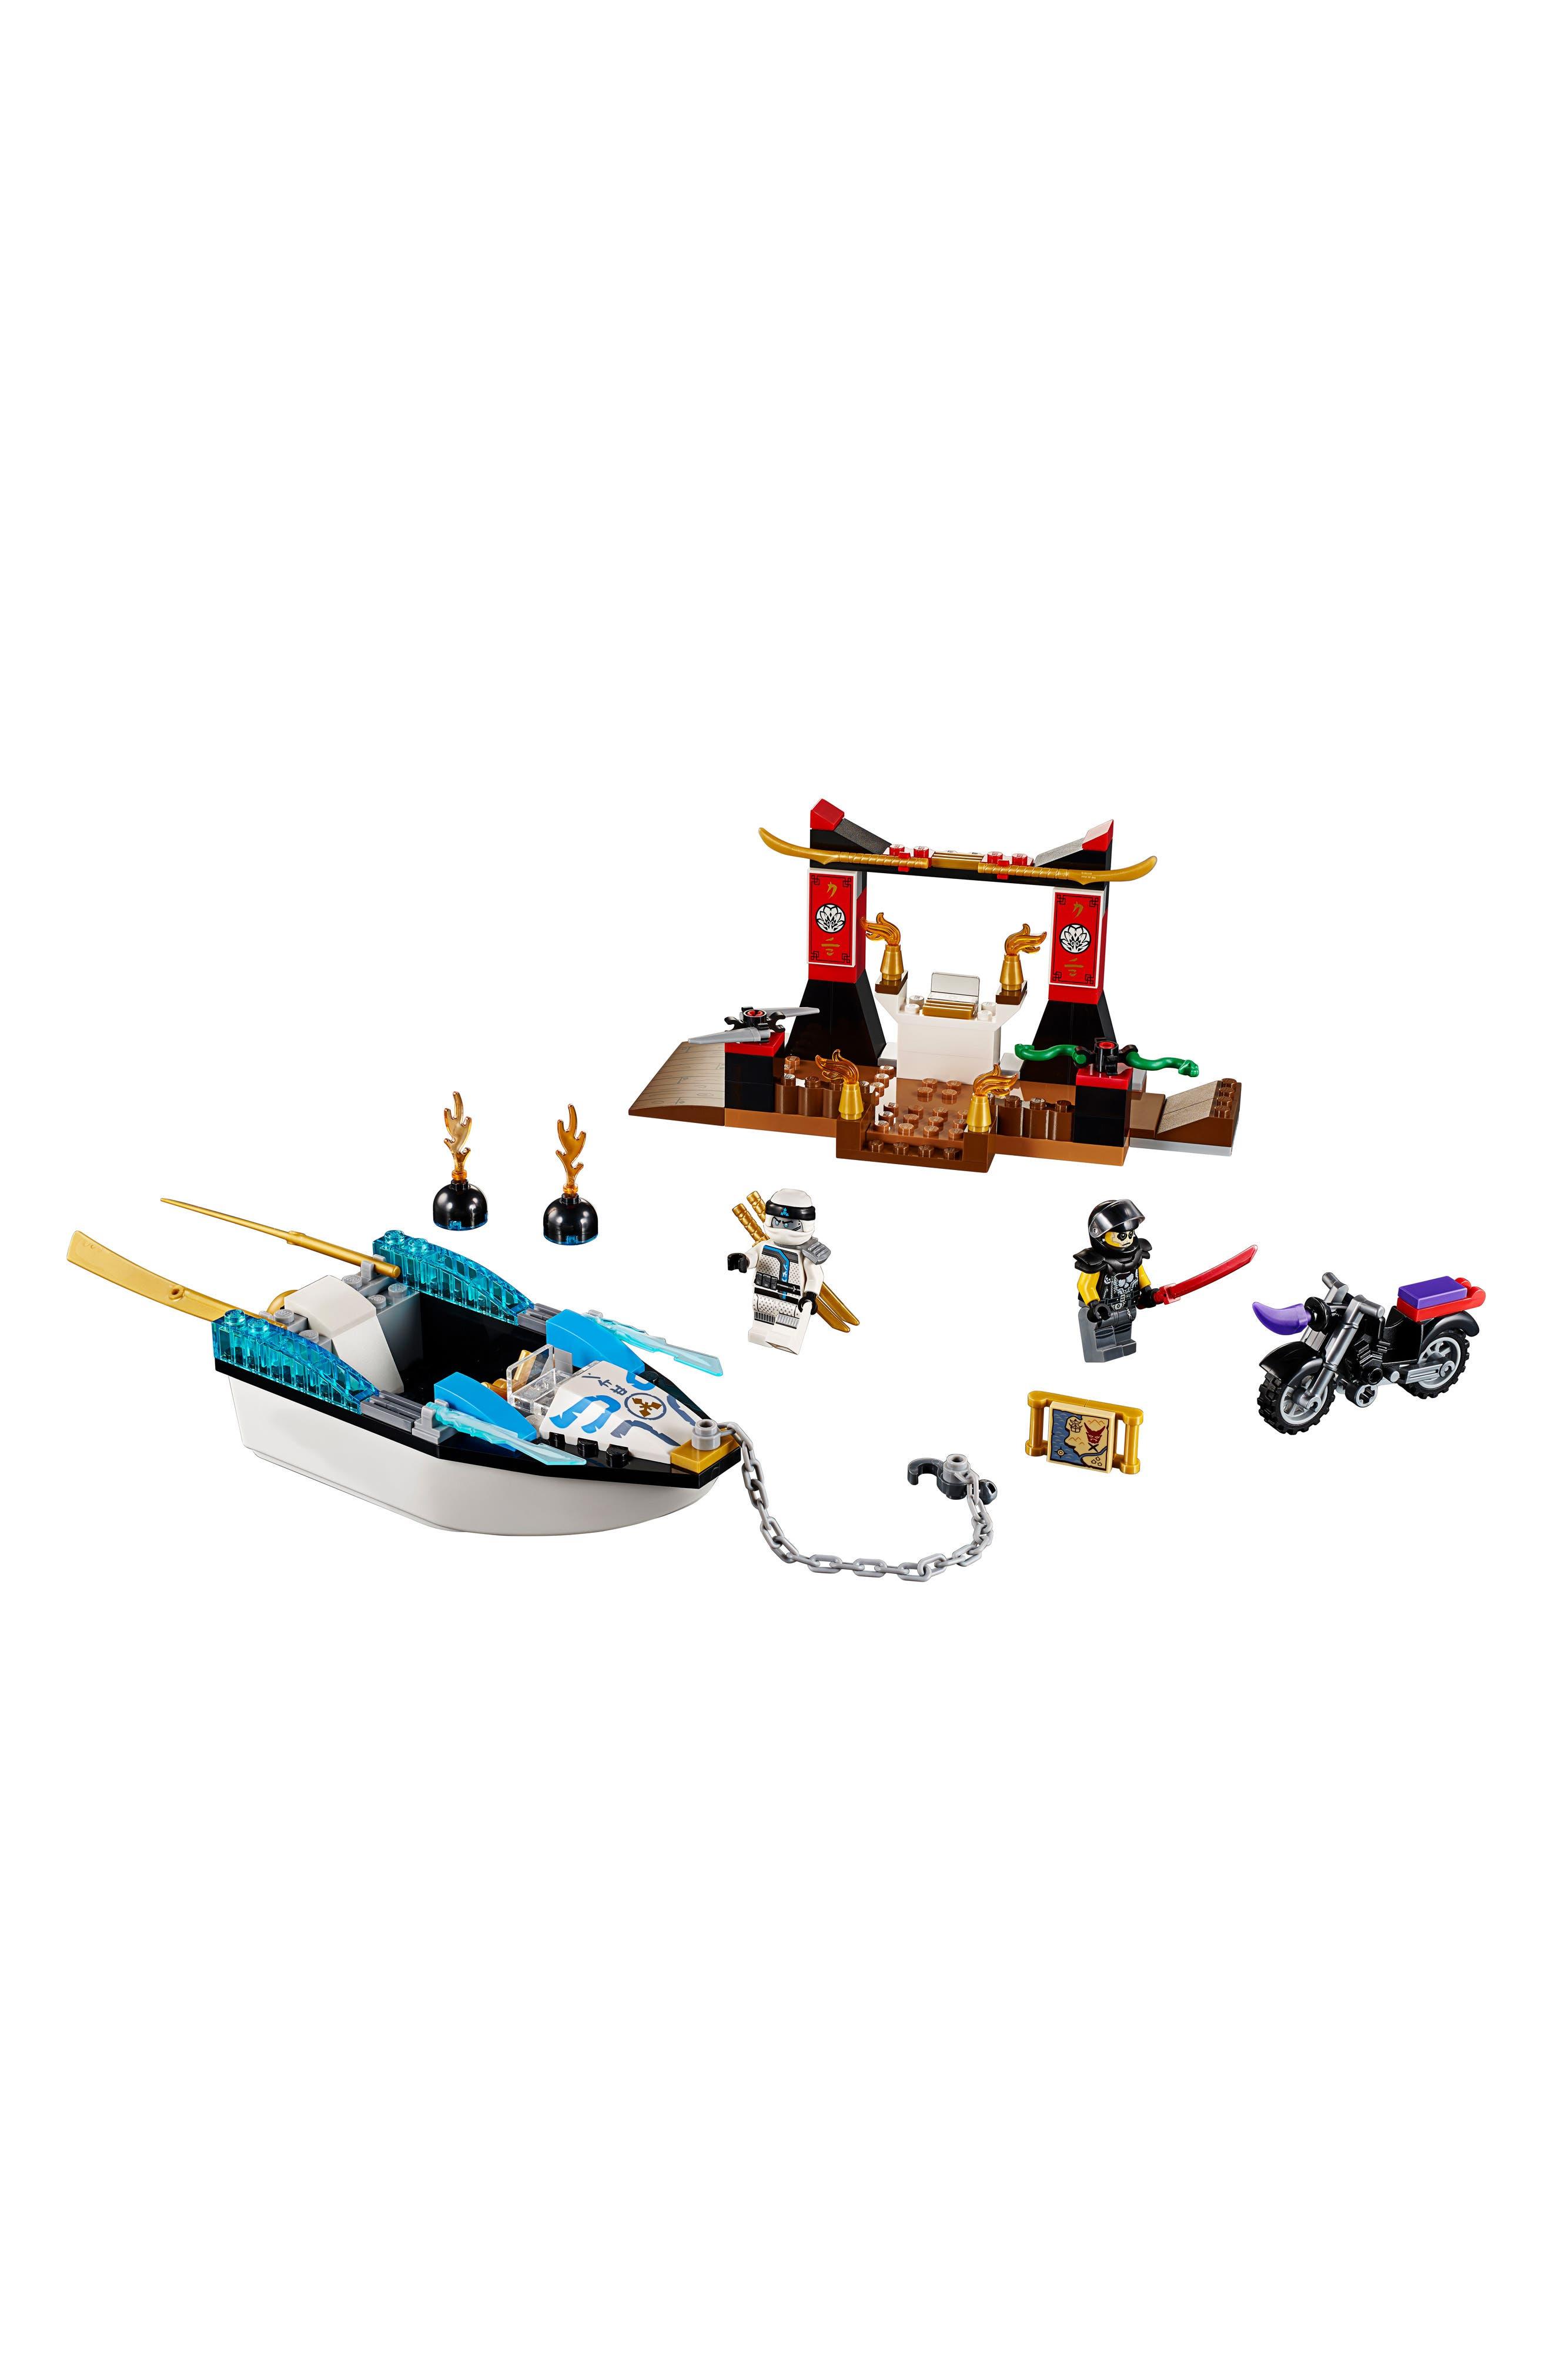 Juniors Zane's Ninja Boat Pursuit Play Set - 10755,                             Alternate thumbnail 2, color,                             001